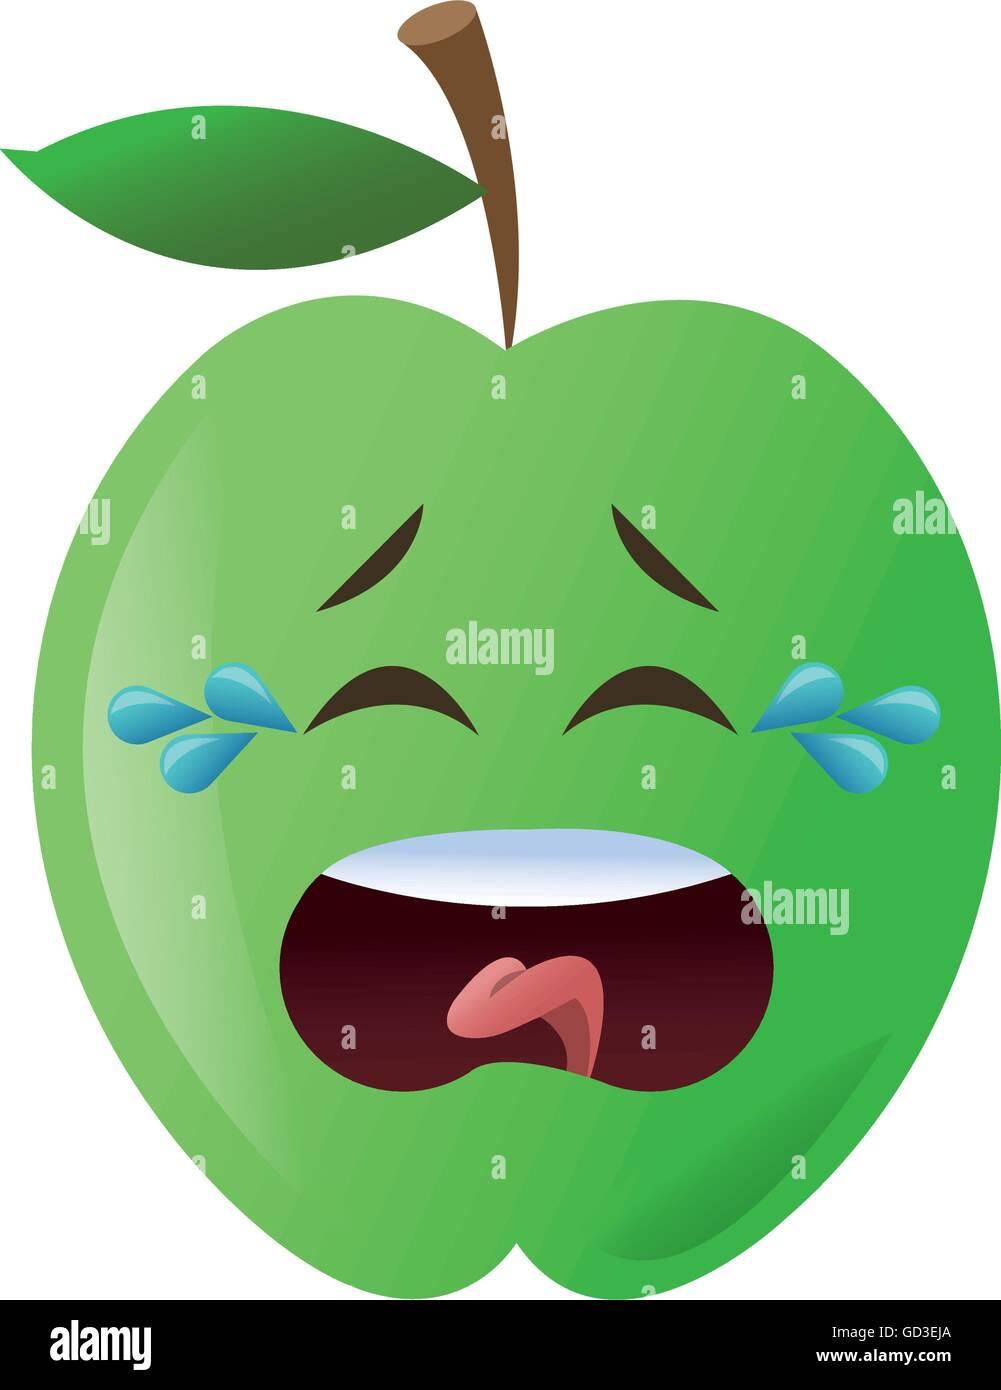 0c979a3483191 crying apple cartoon icon Stock Vector Art   Illustration